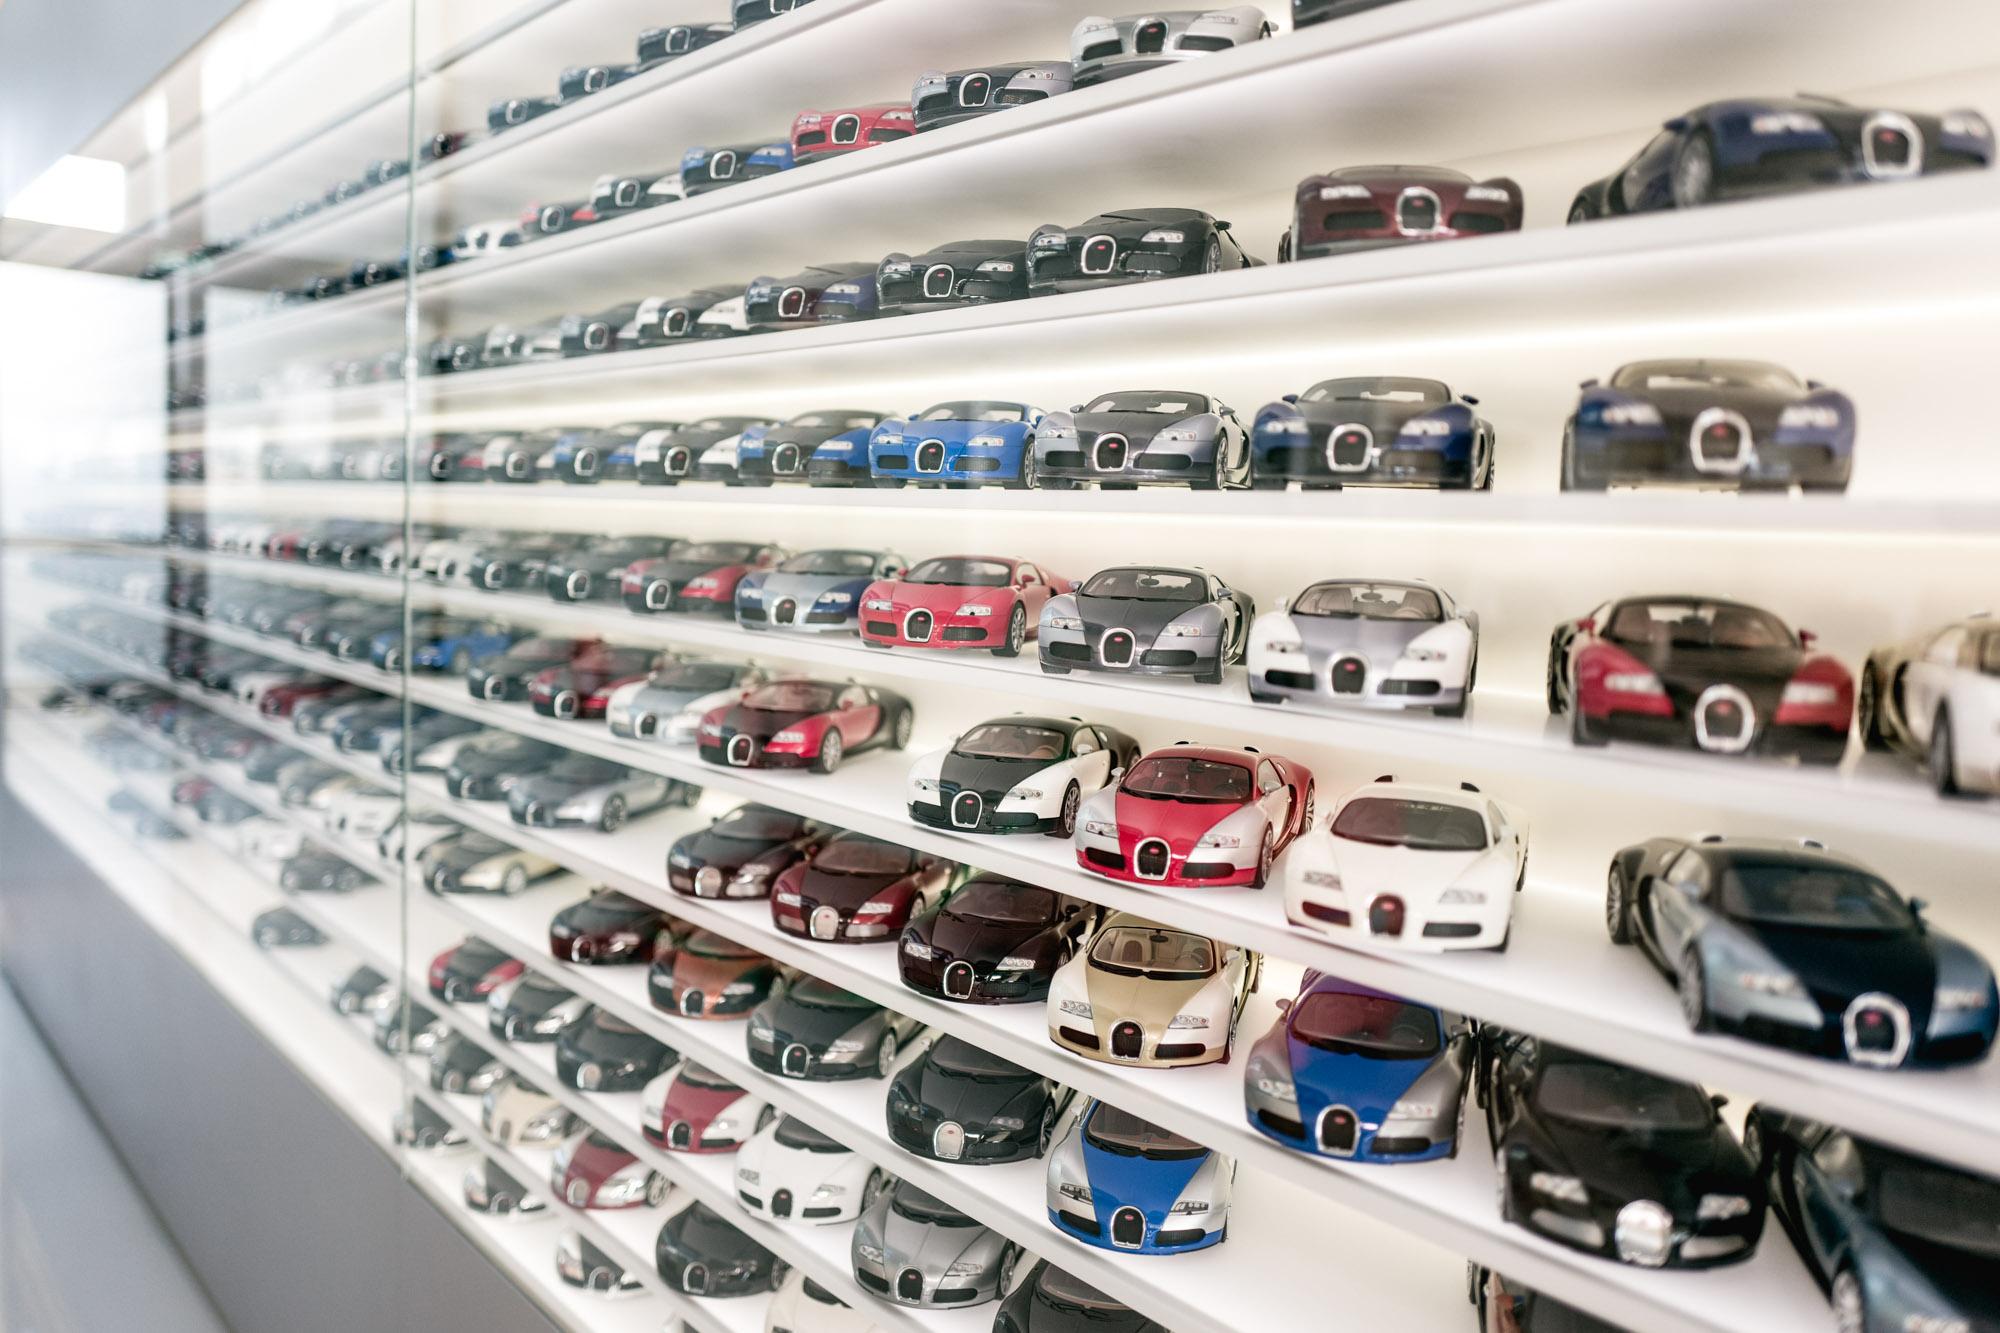 Ateliers Bugatti à Molsheim - Miniatures Bugatti Veyron